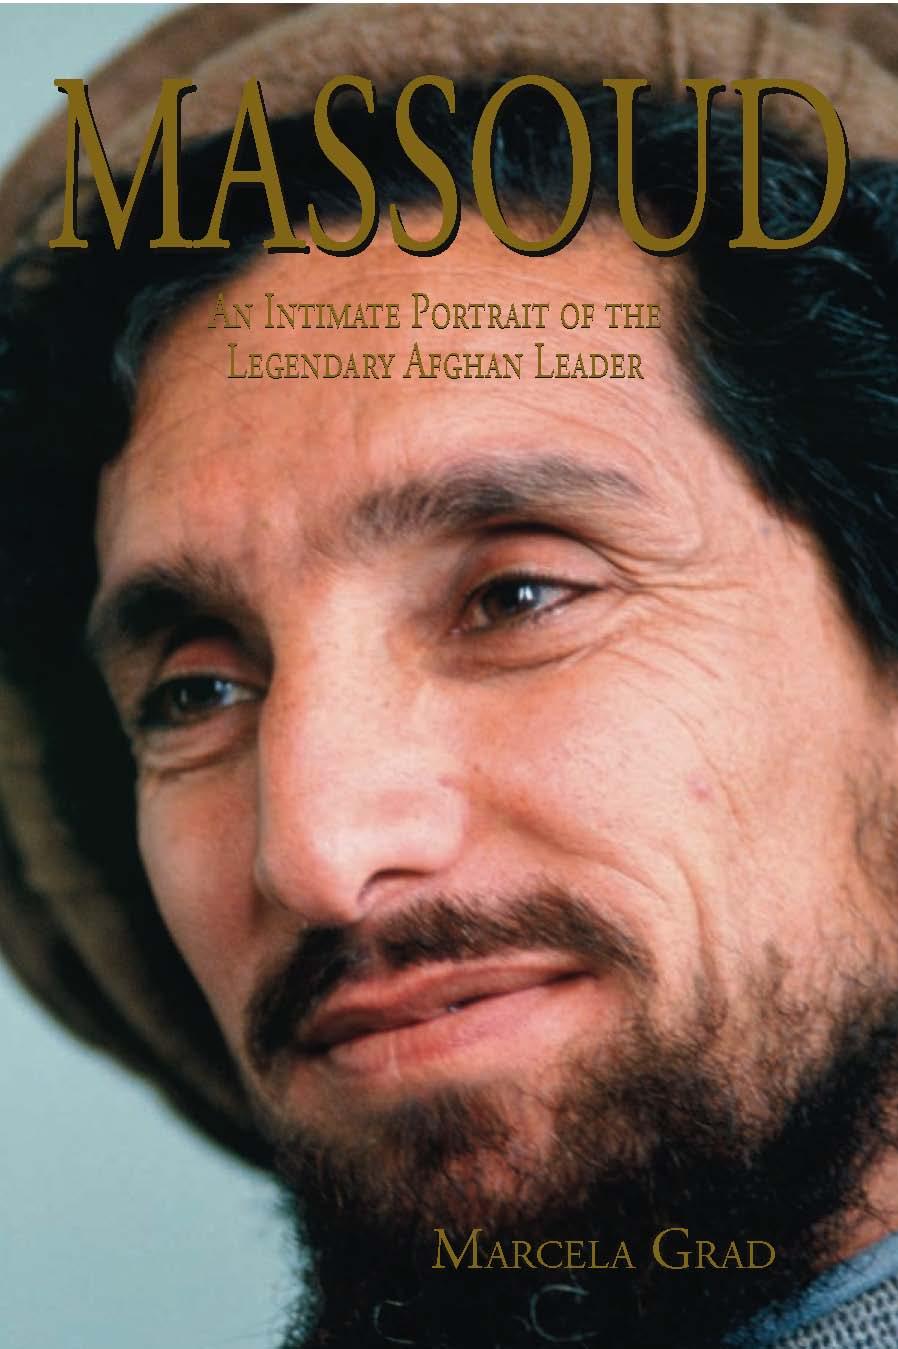 Massoud, from Webster University Press